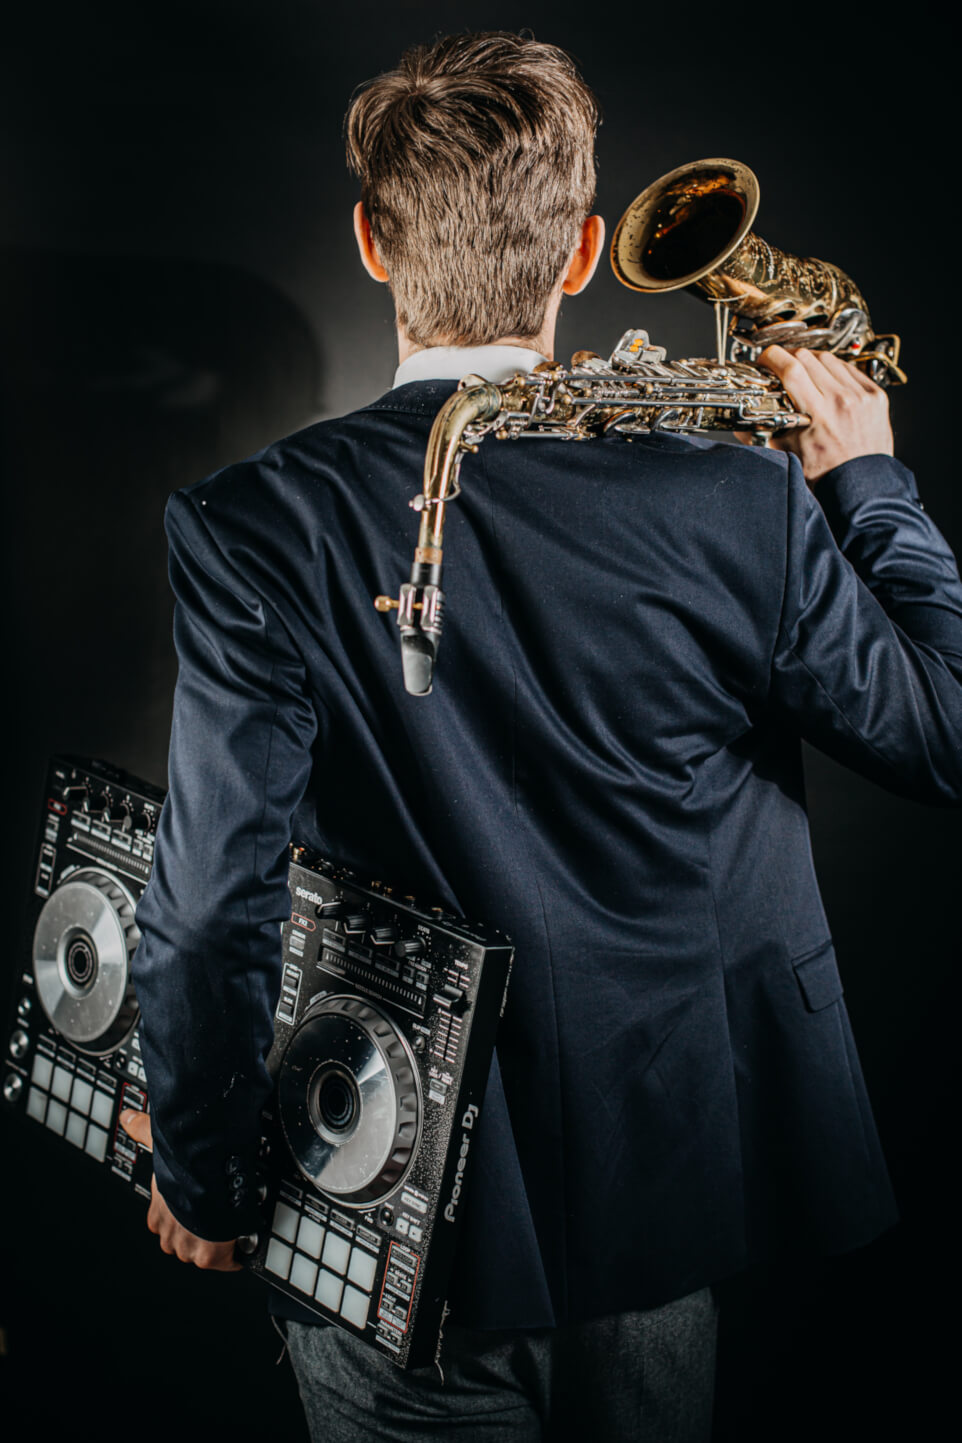 Saxophonist-dj-kombi